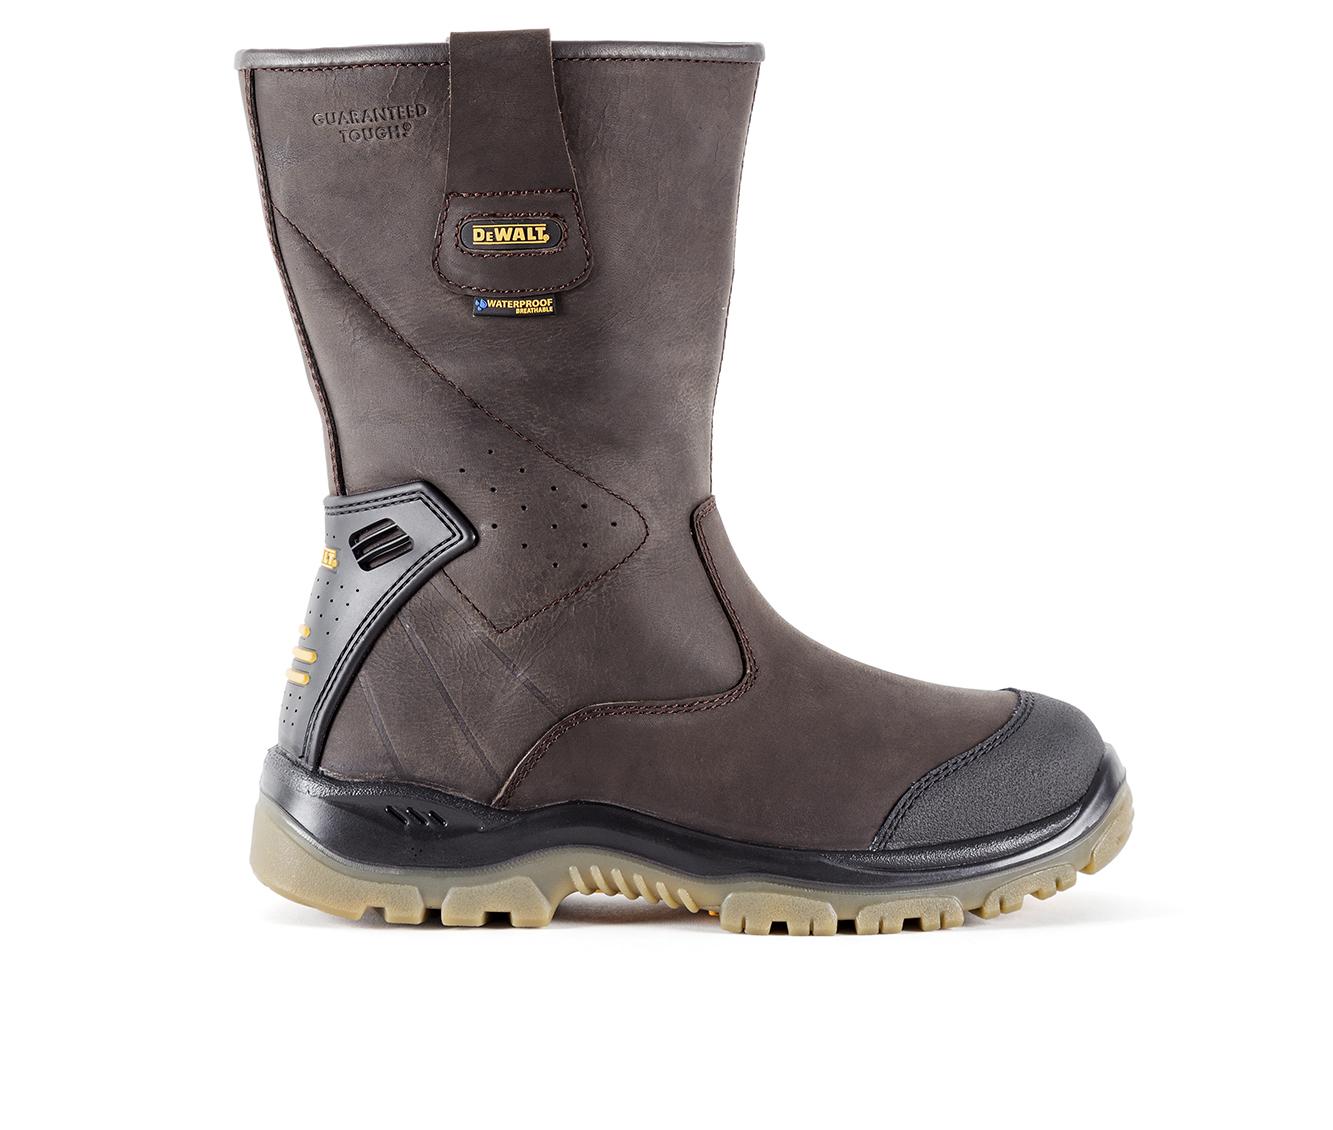 DeWALT Titanium Steel Toe Waterproof Pull On Men's Boots (Brown Leather)